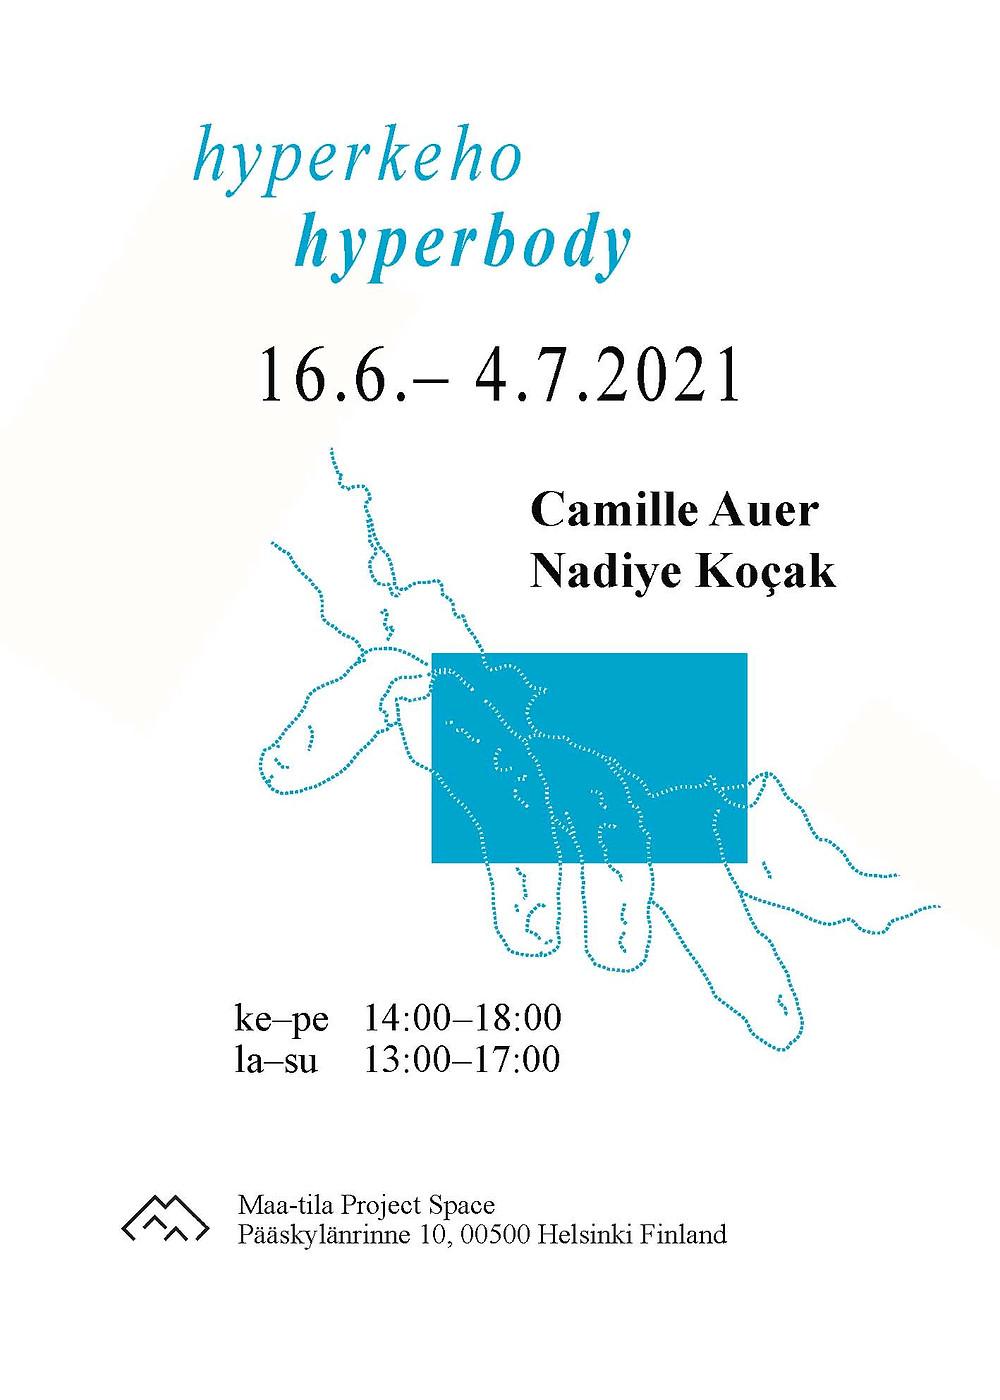 Poster with white background and light blue text:hyperkeho / hyperbody. followed by black text: 16.6.–4.7.2021, Camille Auer, Nadiye Koçak. A light blue dotted linear drawing of a hand is superimposed over a light blue rectangle. Black text:ke–pe 14–18,la–su 13–17. MAA-tila project space logo, Pääskylänrinne 10, Helsinki Finland